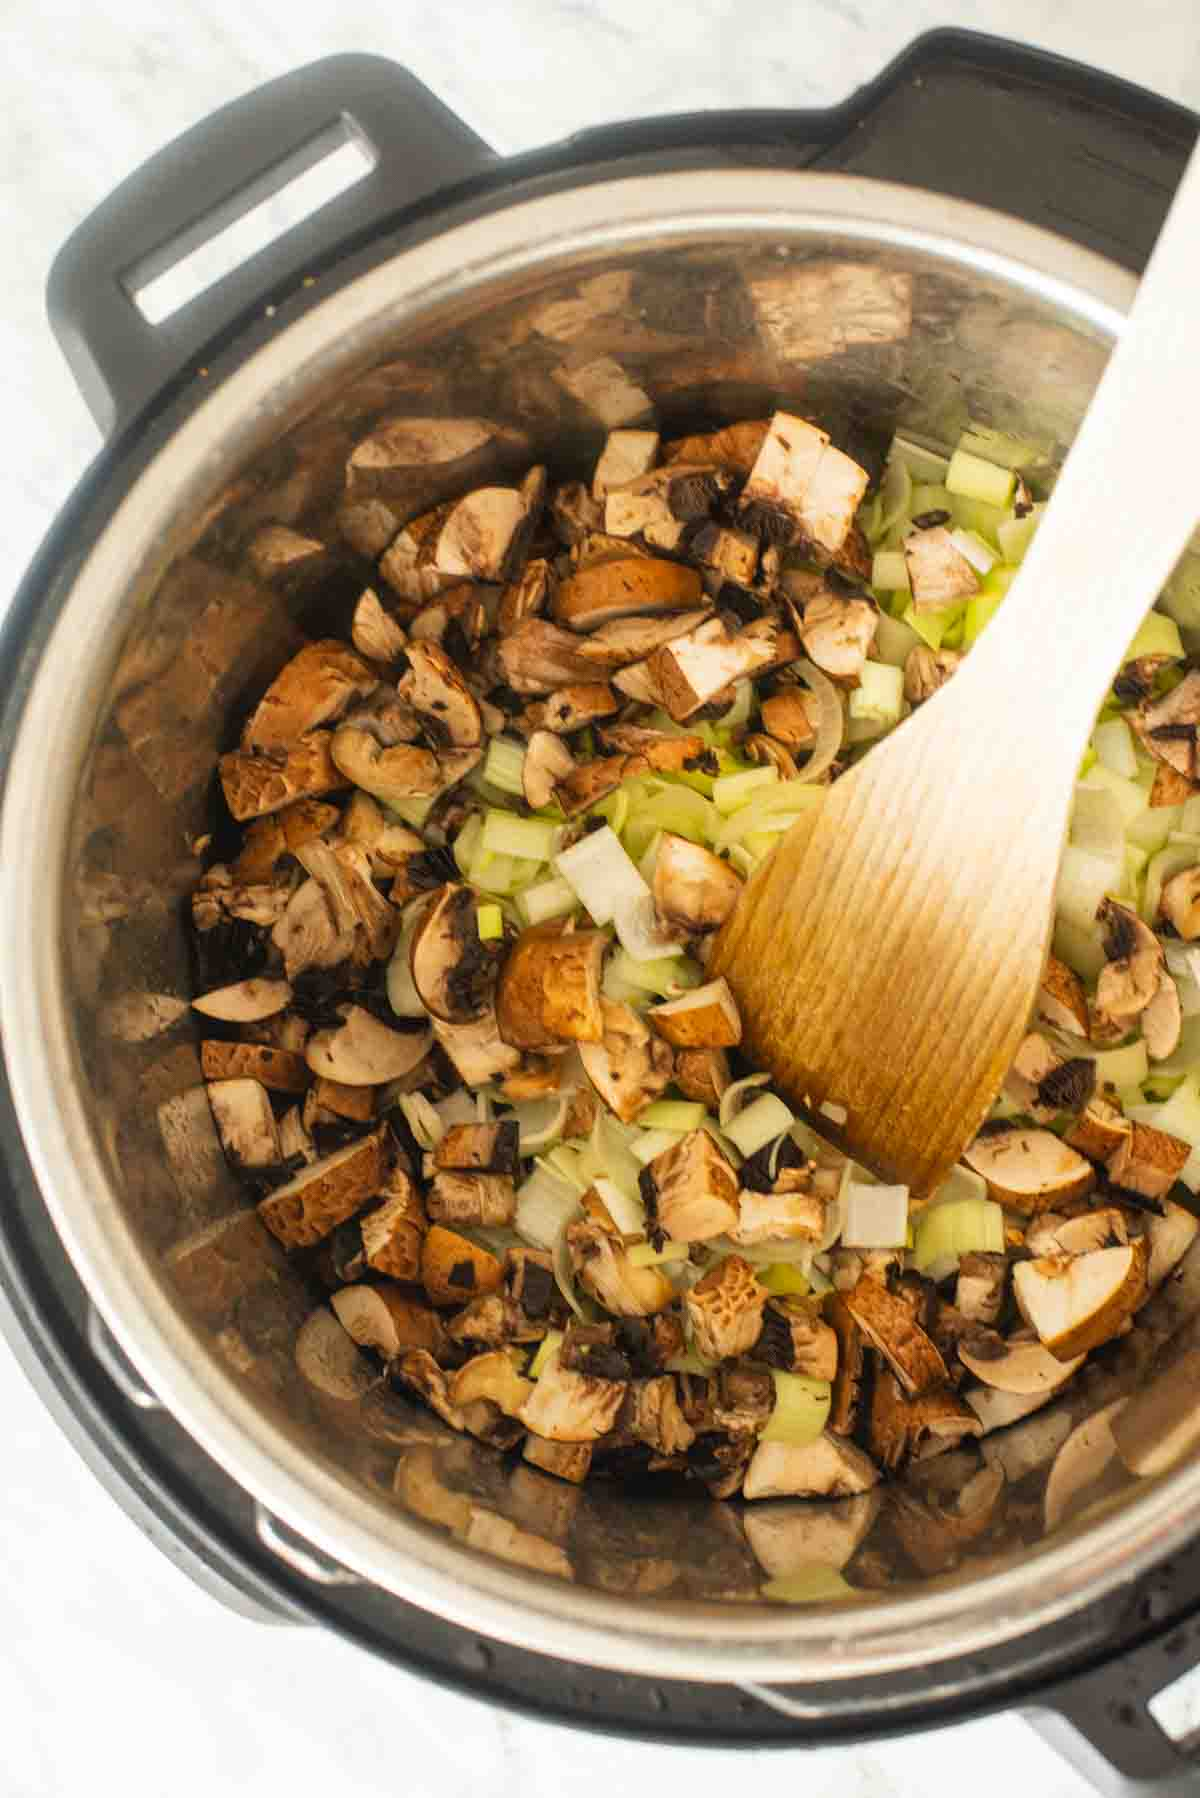 Chopped leeks, mushrooms inside an Instant Pot